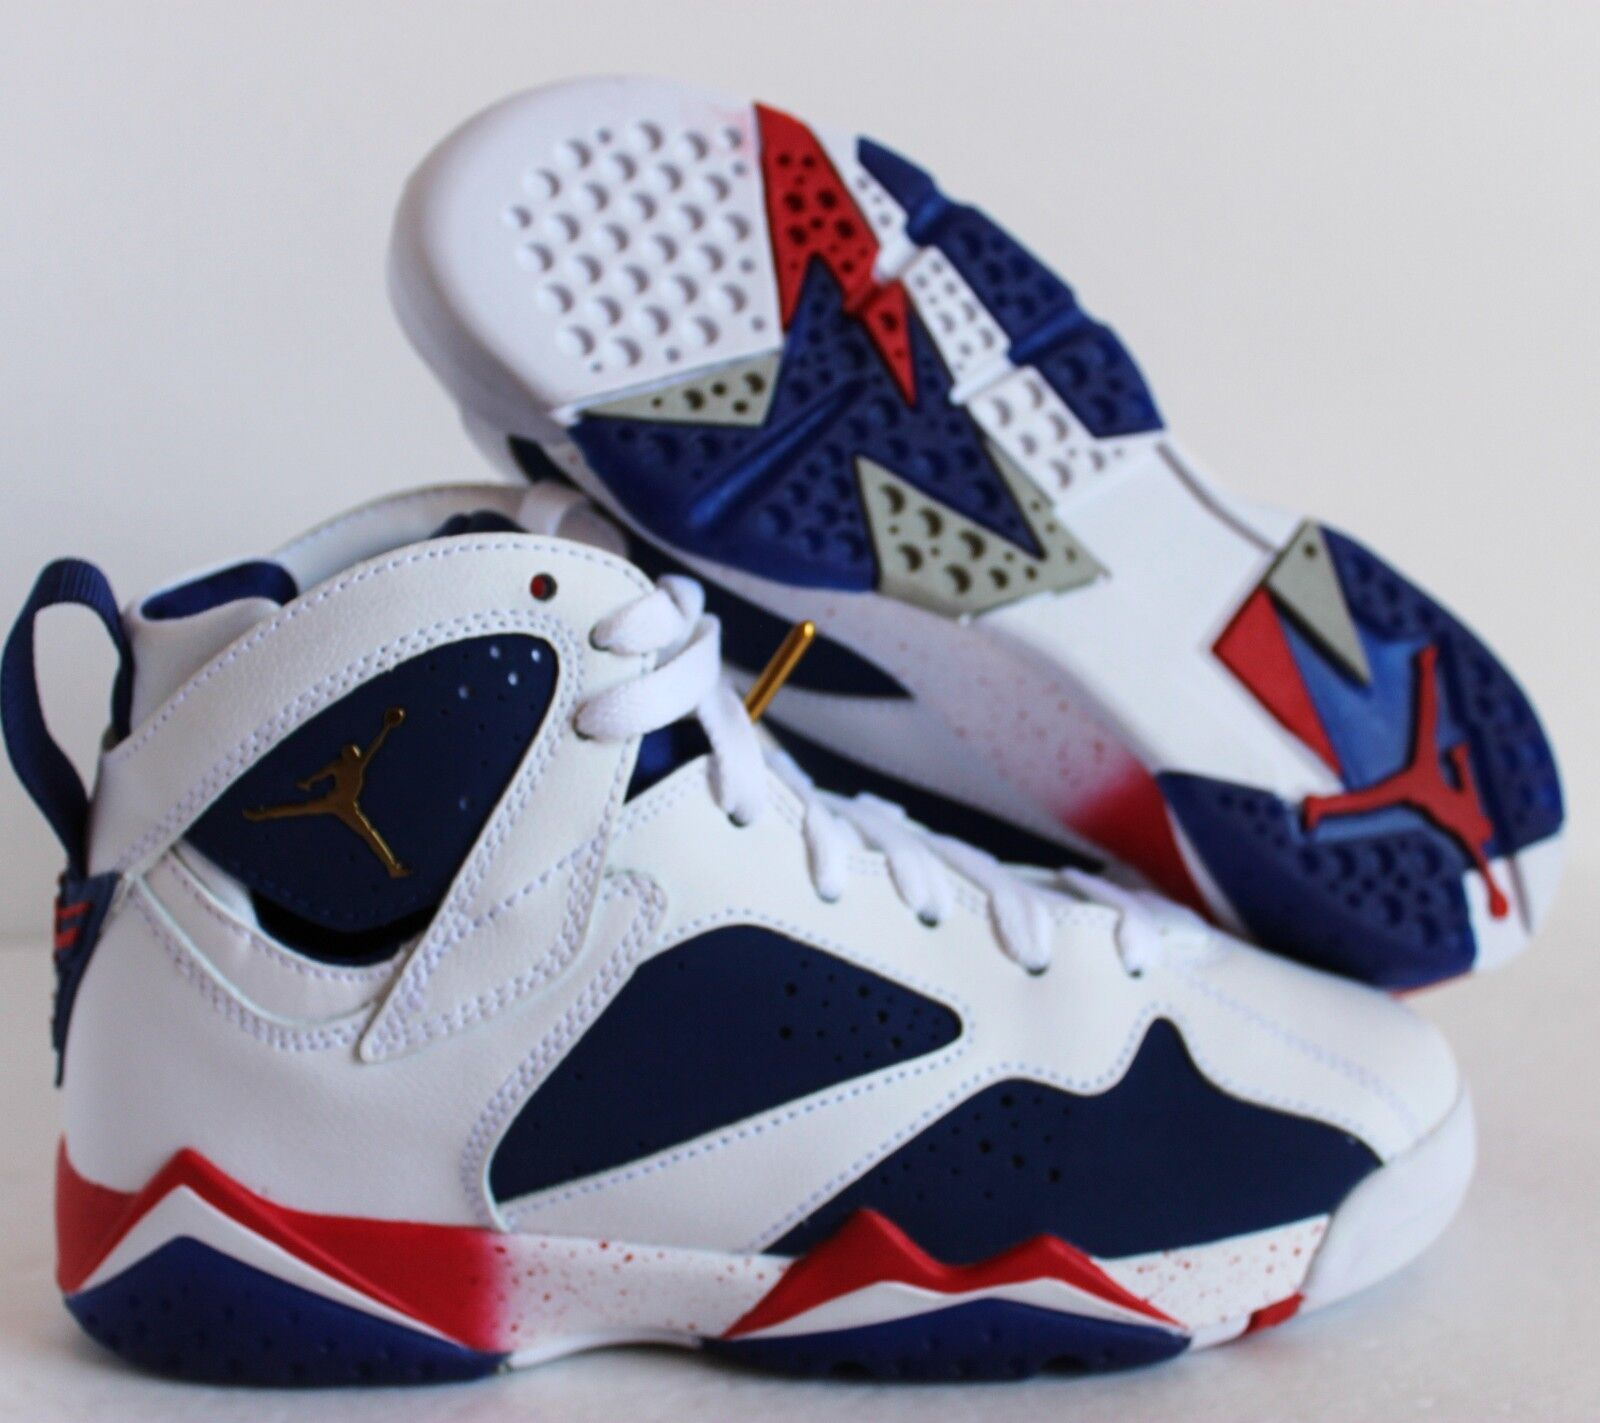 Купить Nike Air Jordan 7 Retro VII BG Olympic на eBay.com из Америки ... dafc974ded